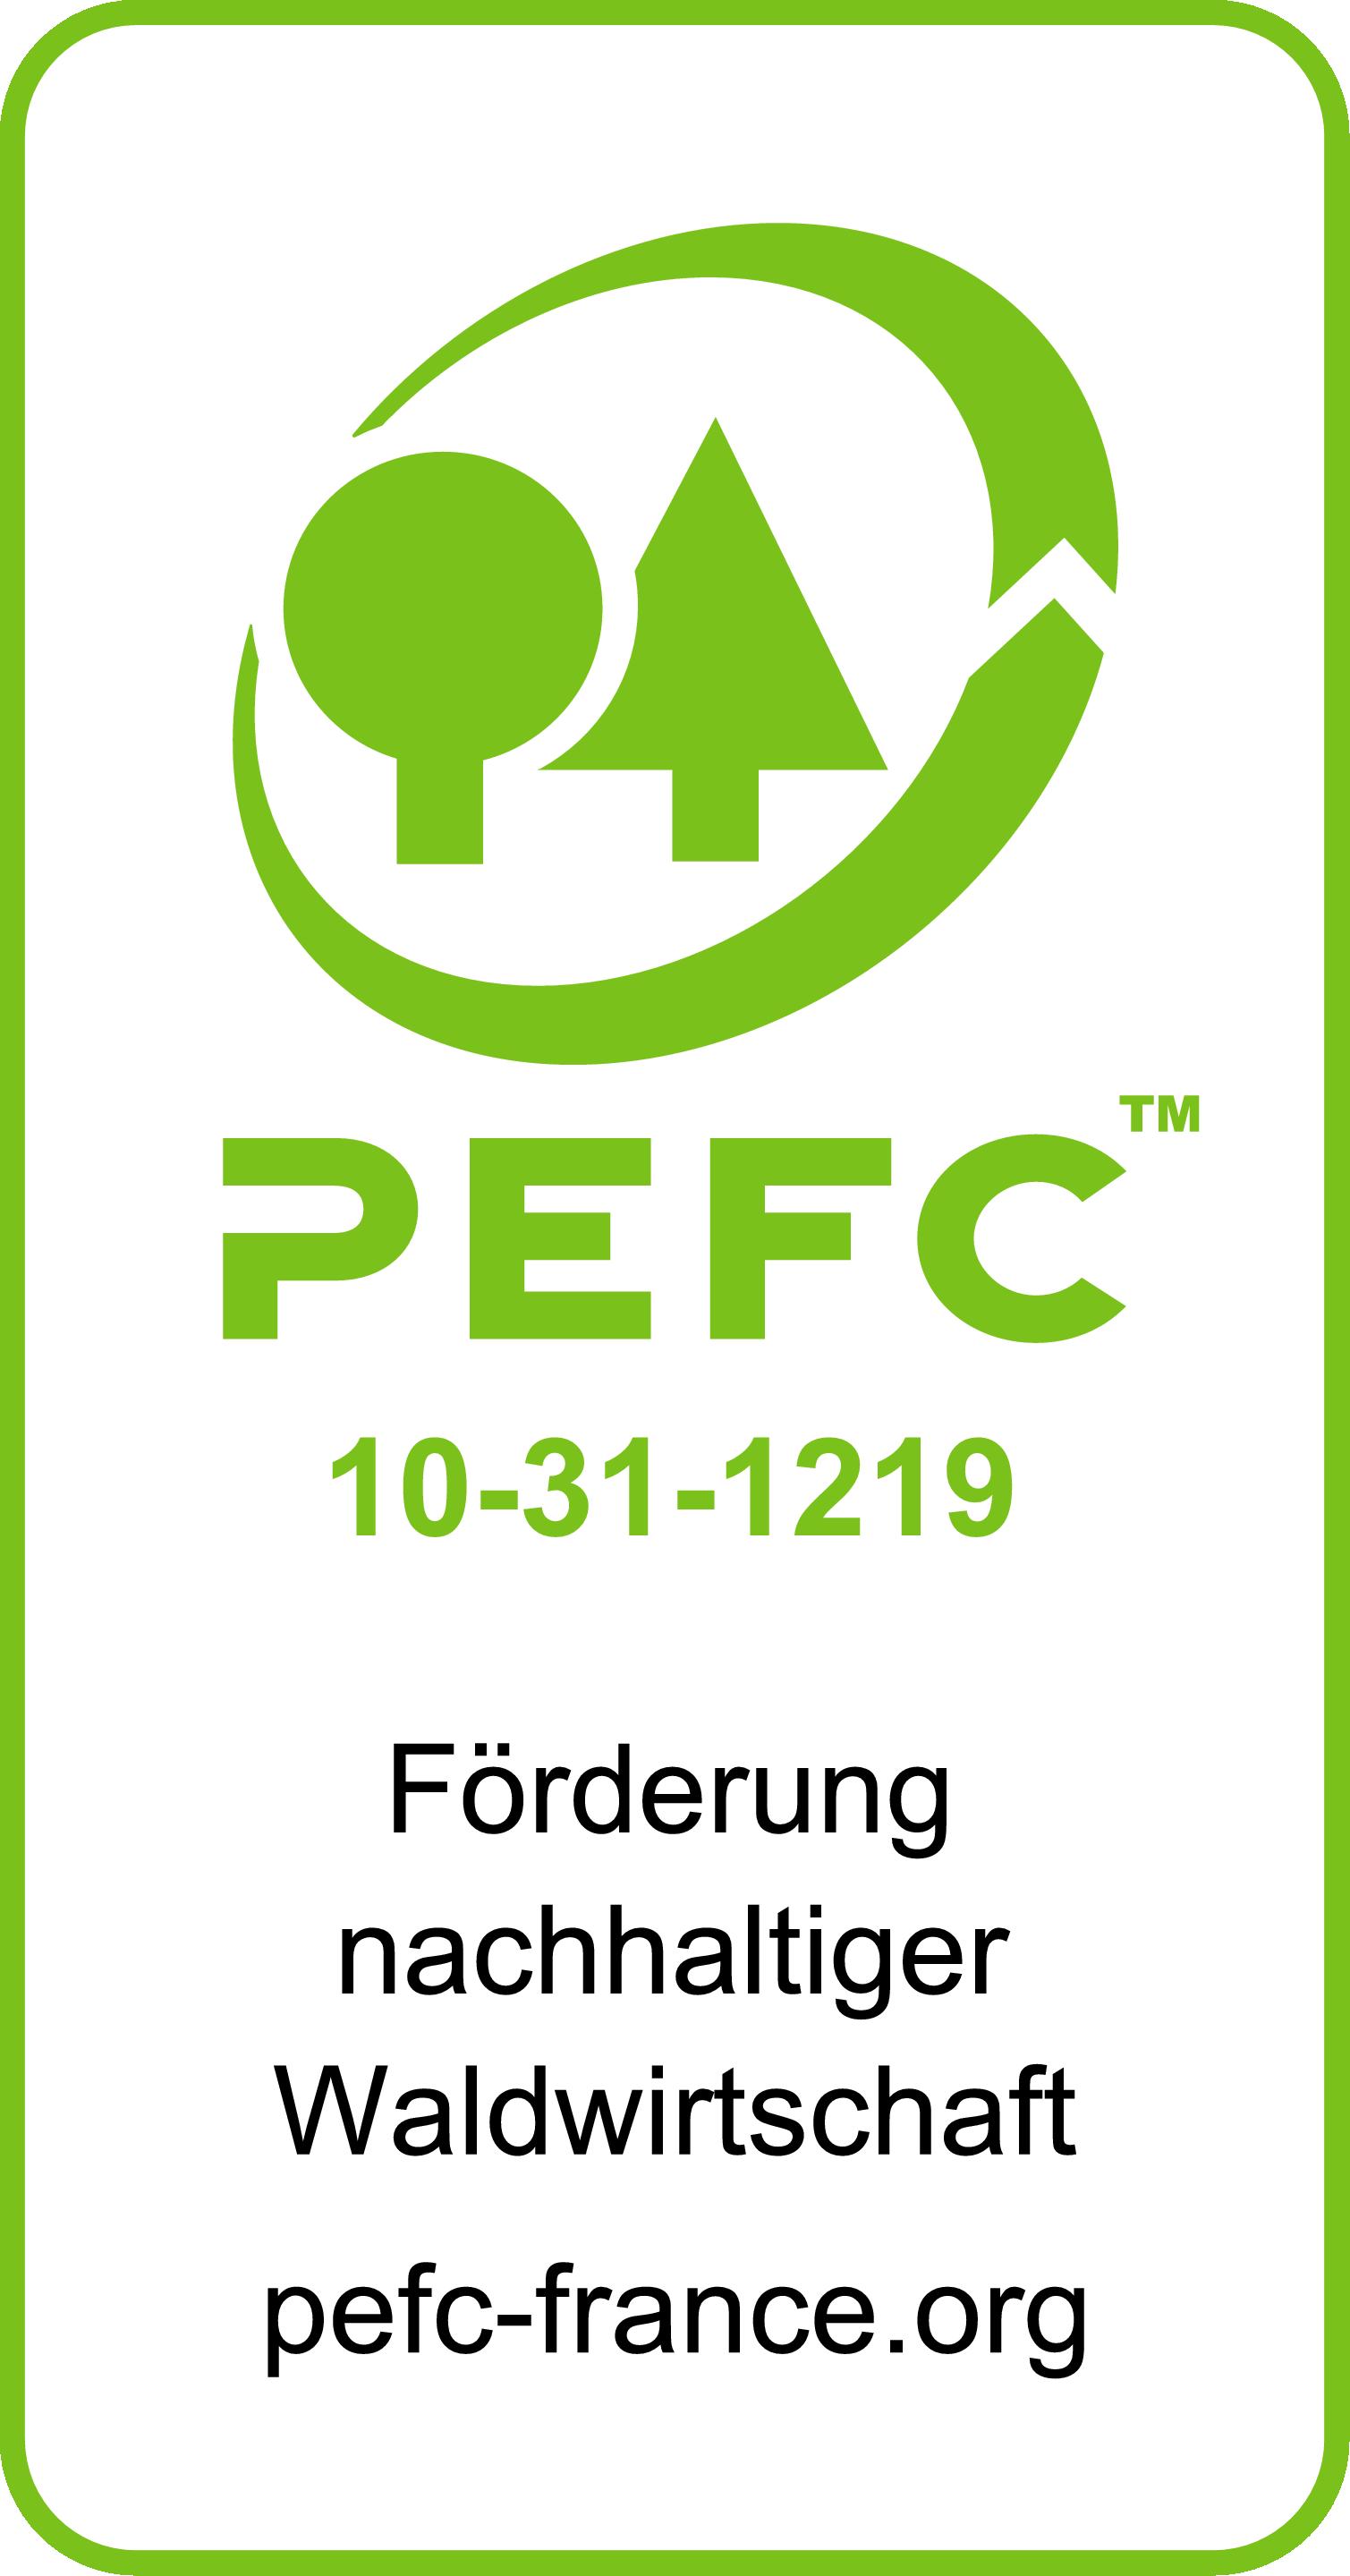 pefc-logo_de